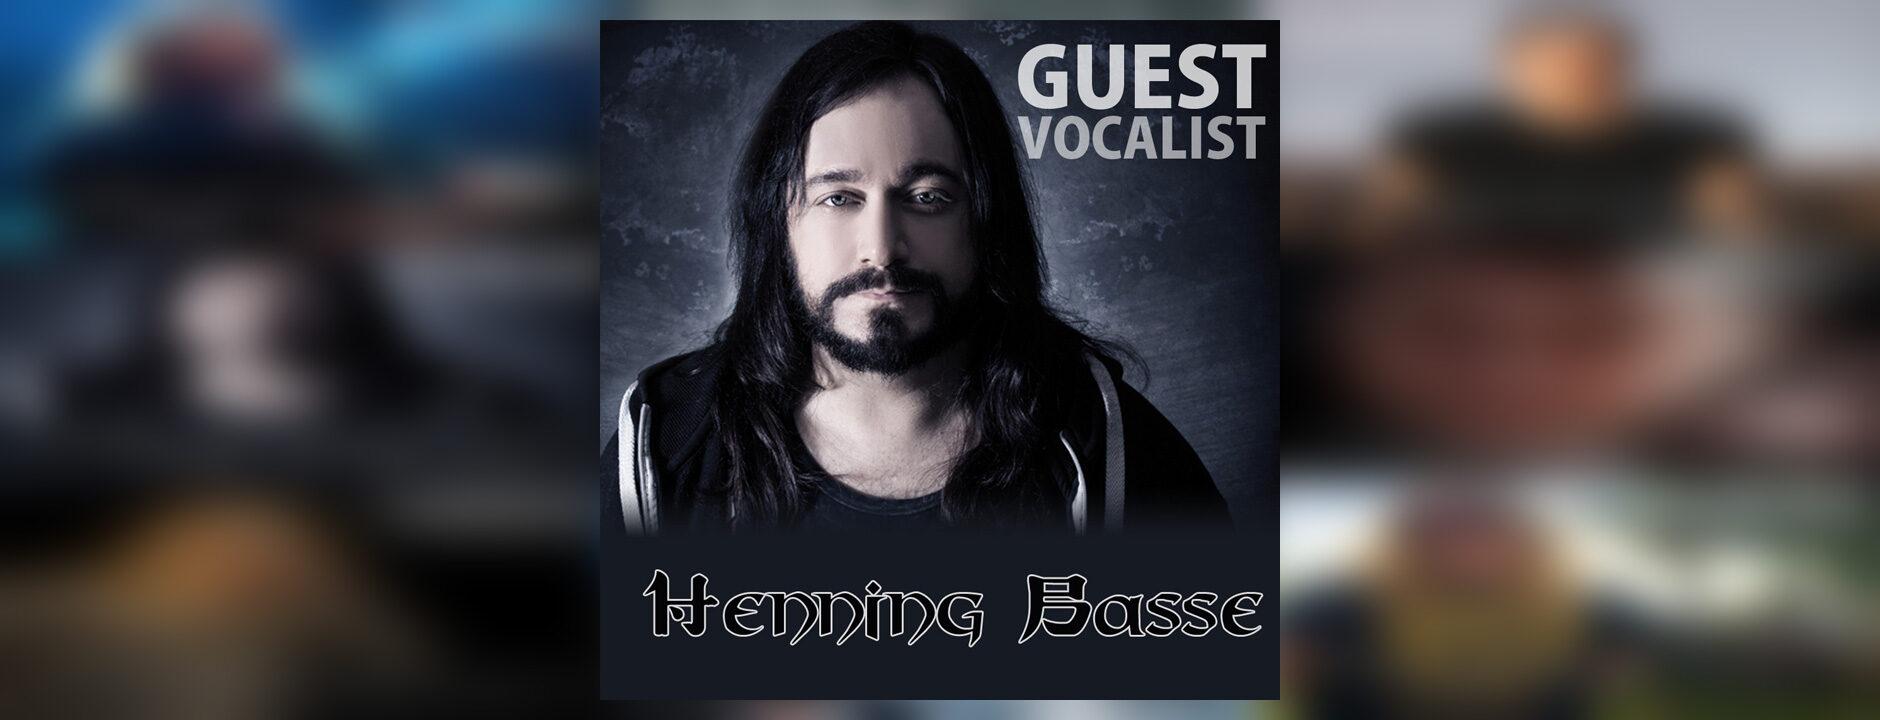 Henning Basse